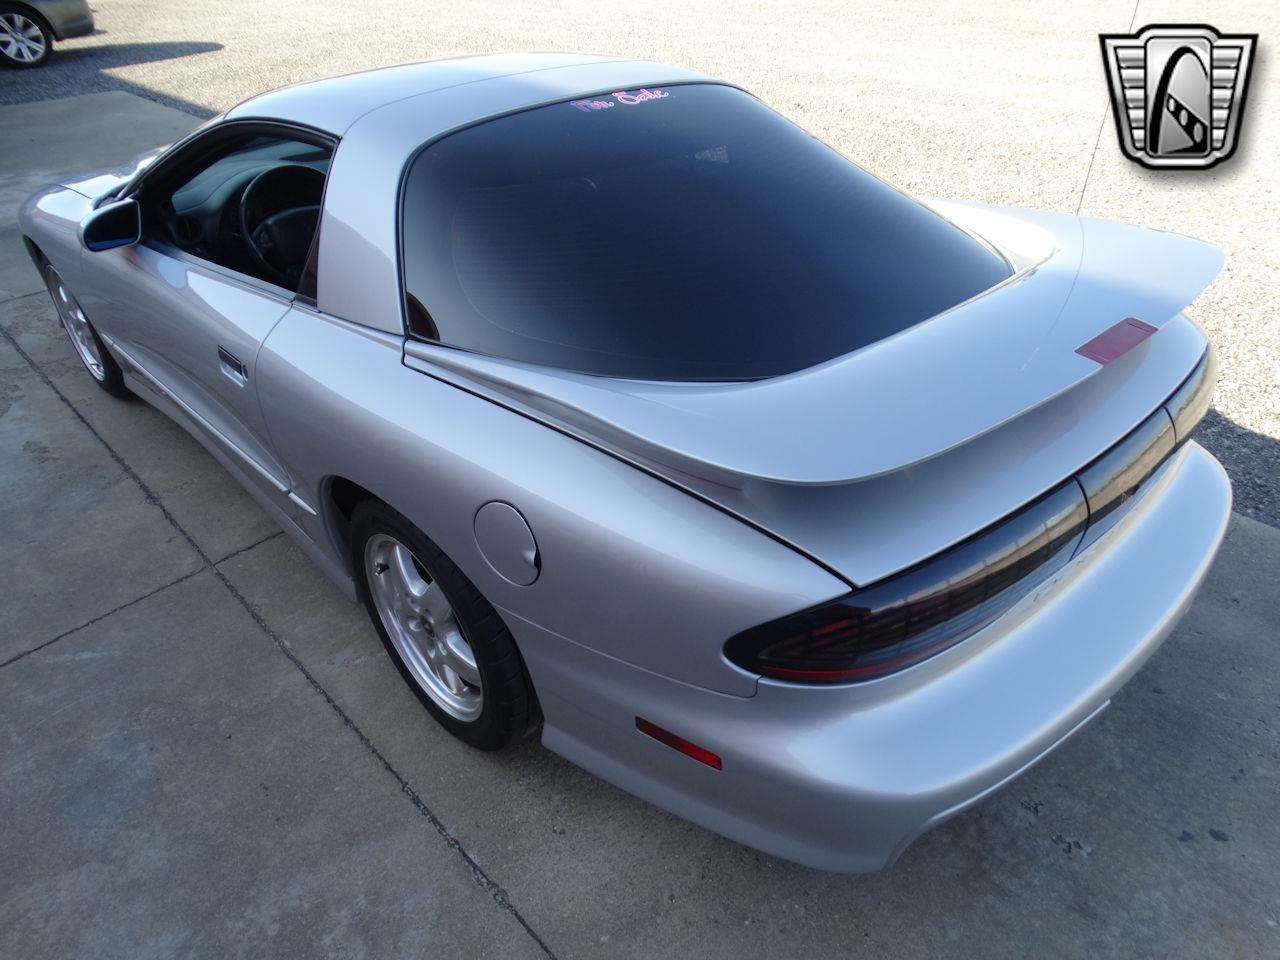 1996 Pontiac Firebird Trans Am (CC-1421955) for sale in O'Fallon, Illinois